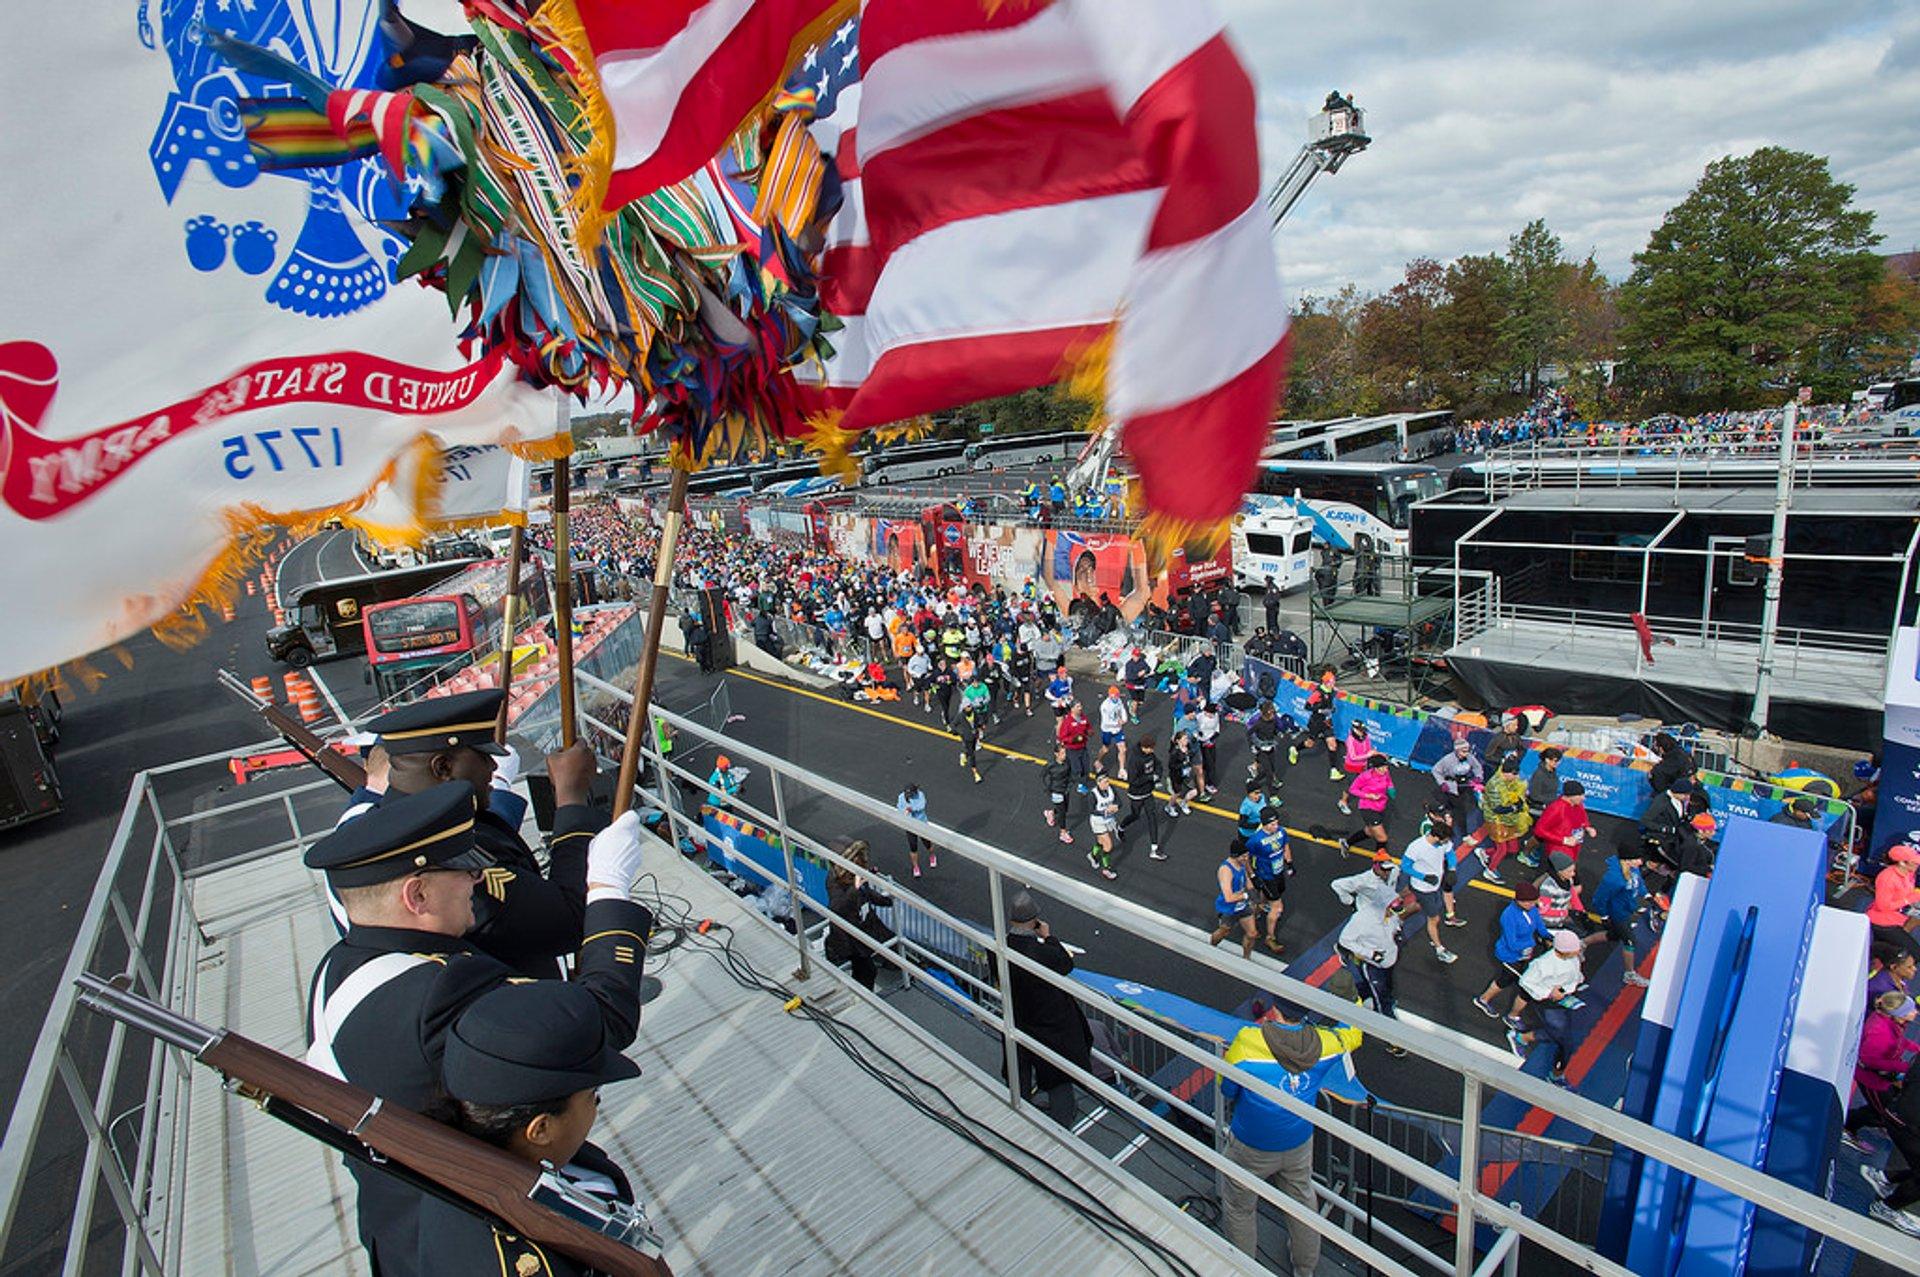 New York City Marathon in New York - Best Season 2020